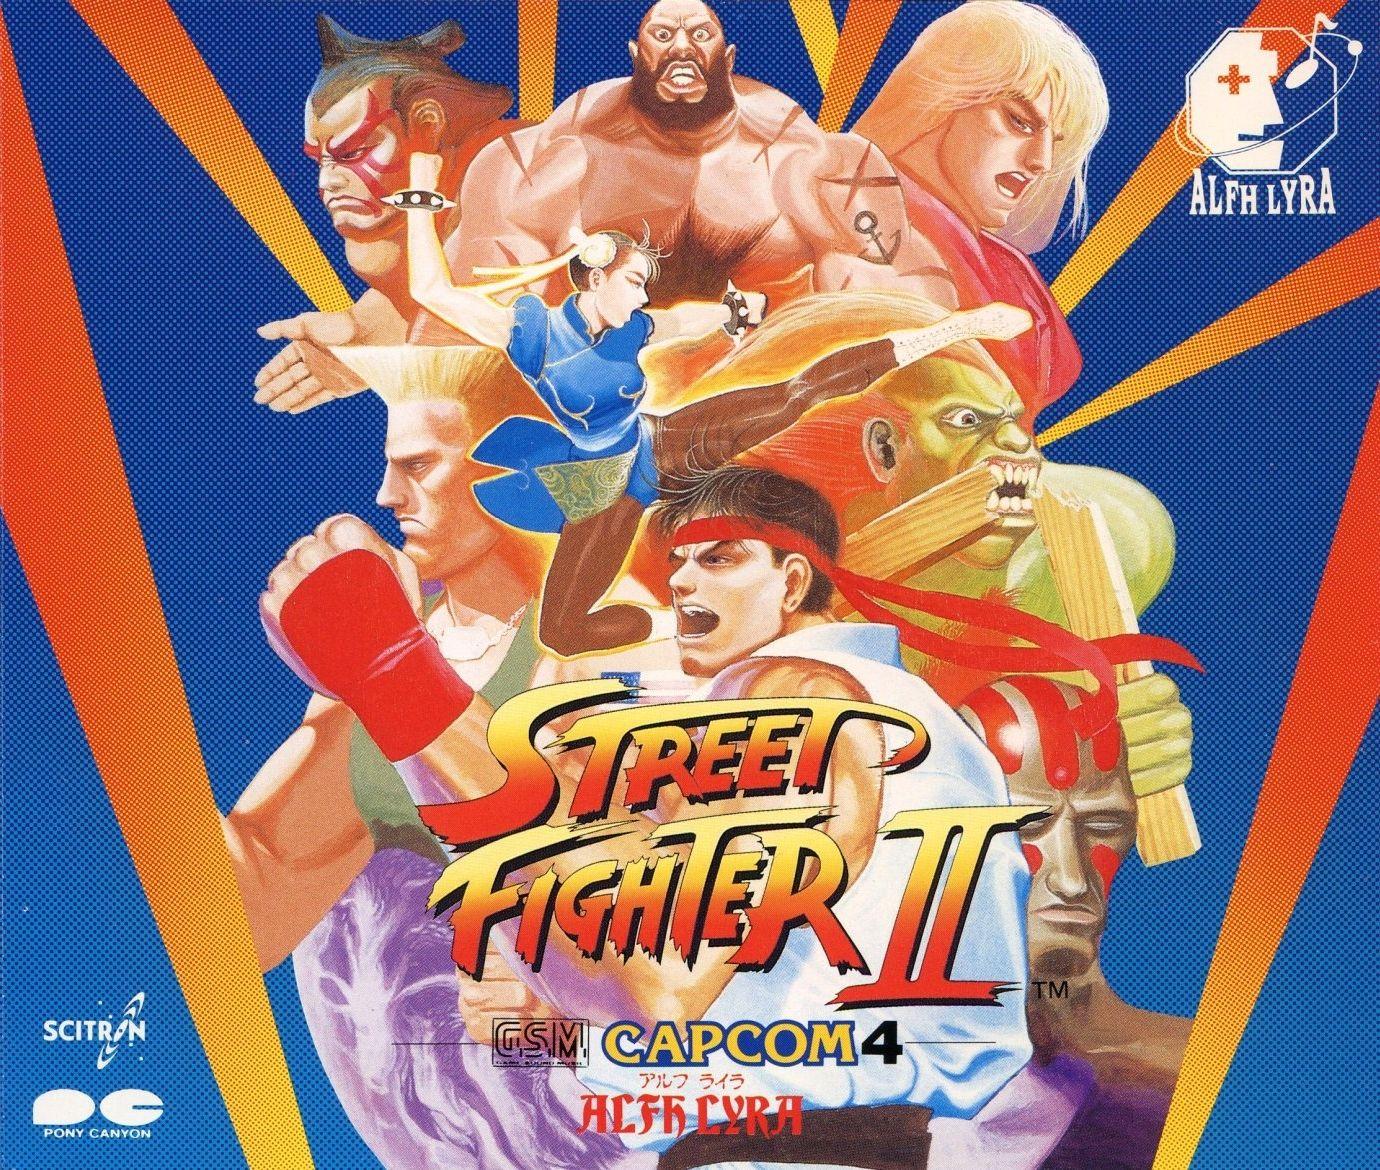 Street Fighter II -G.S.M. CAPC...